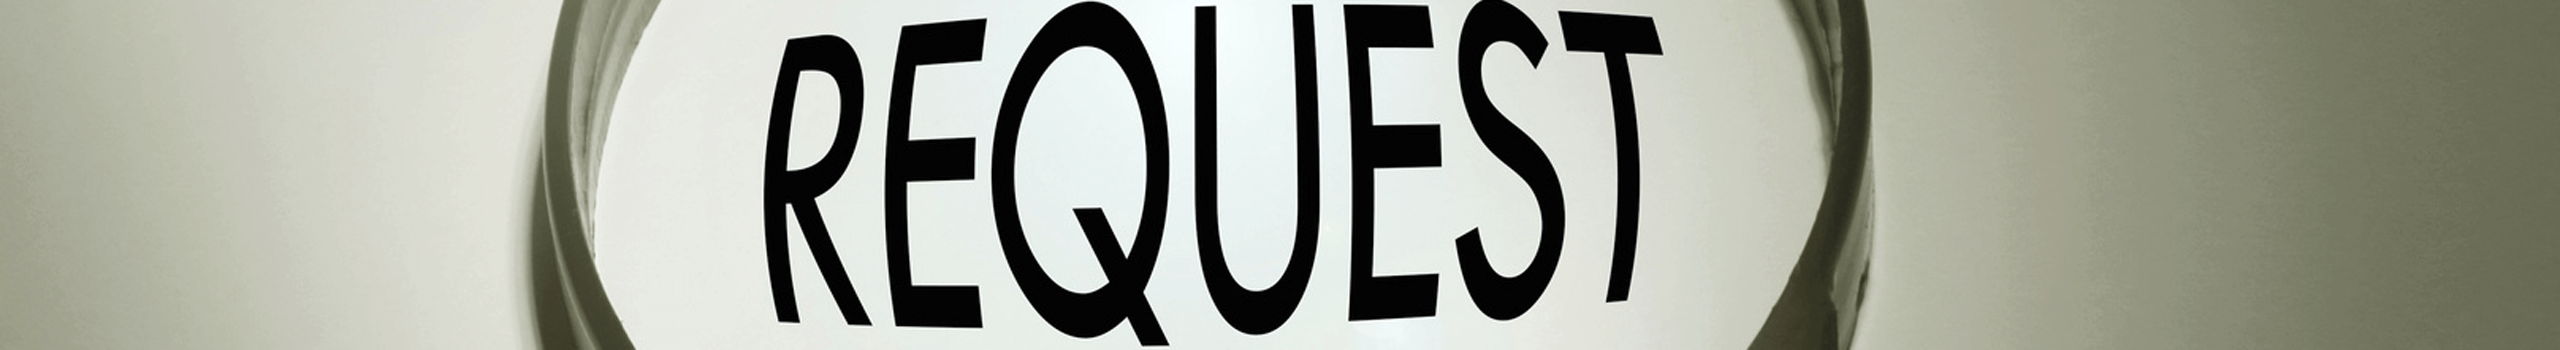 request-banner